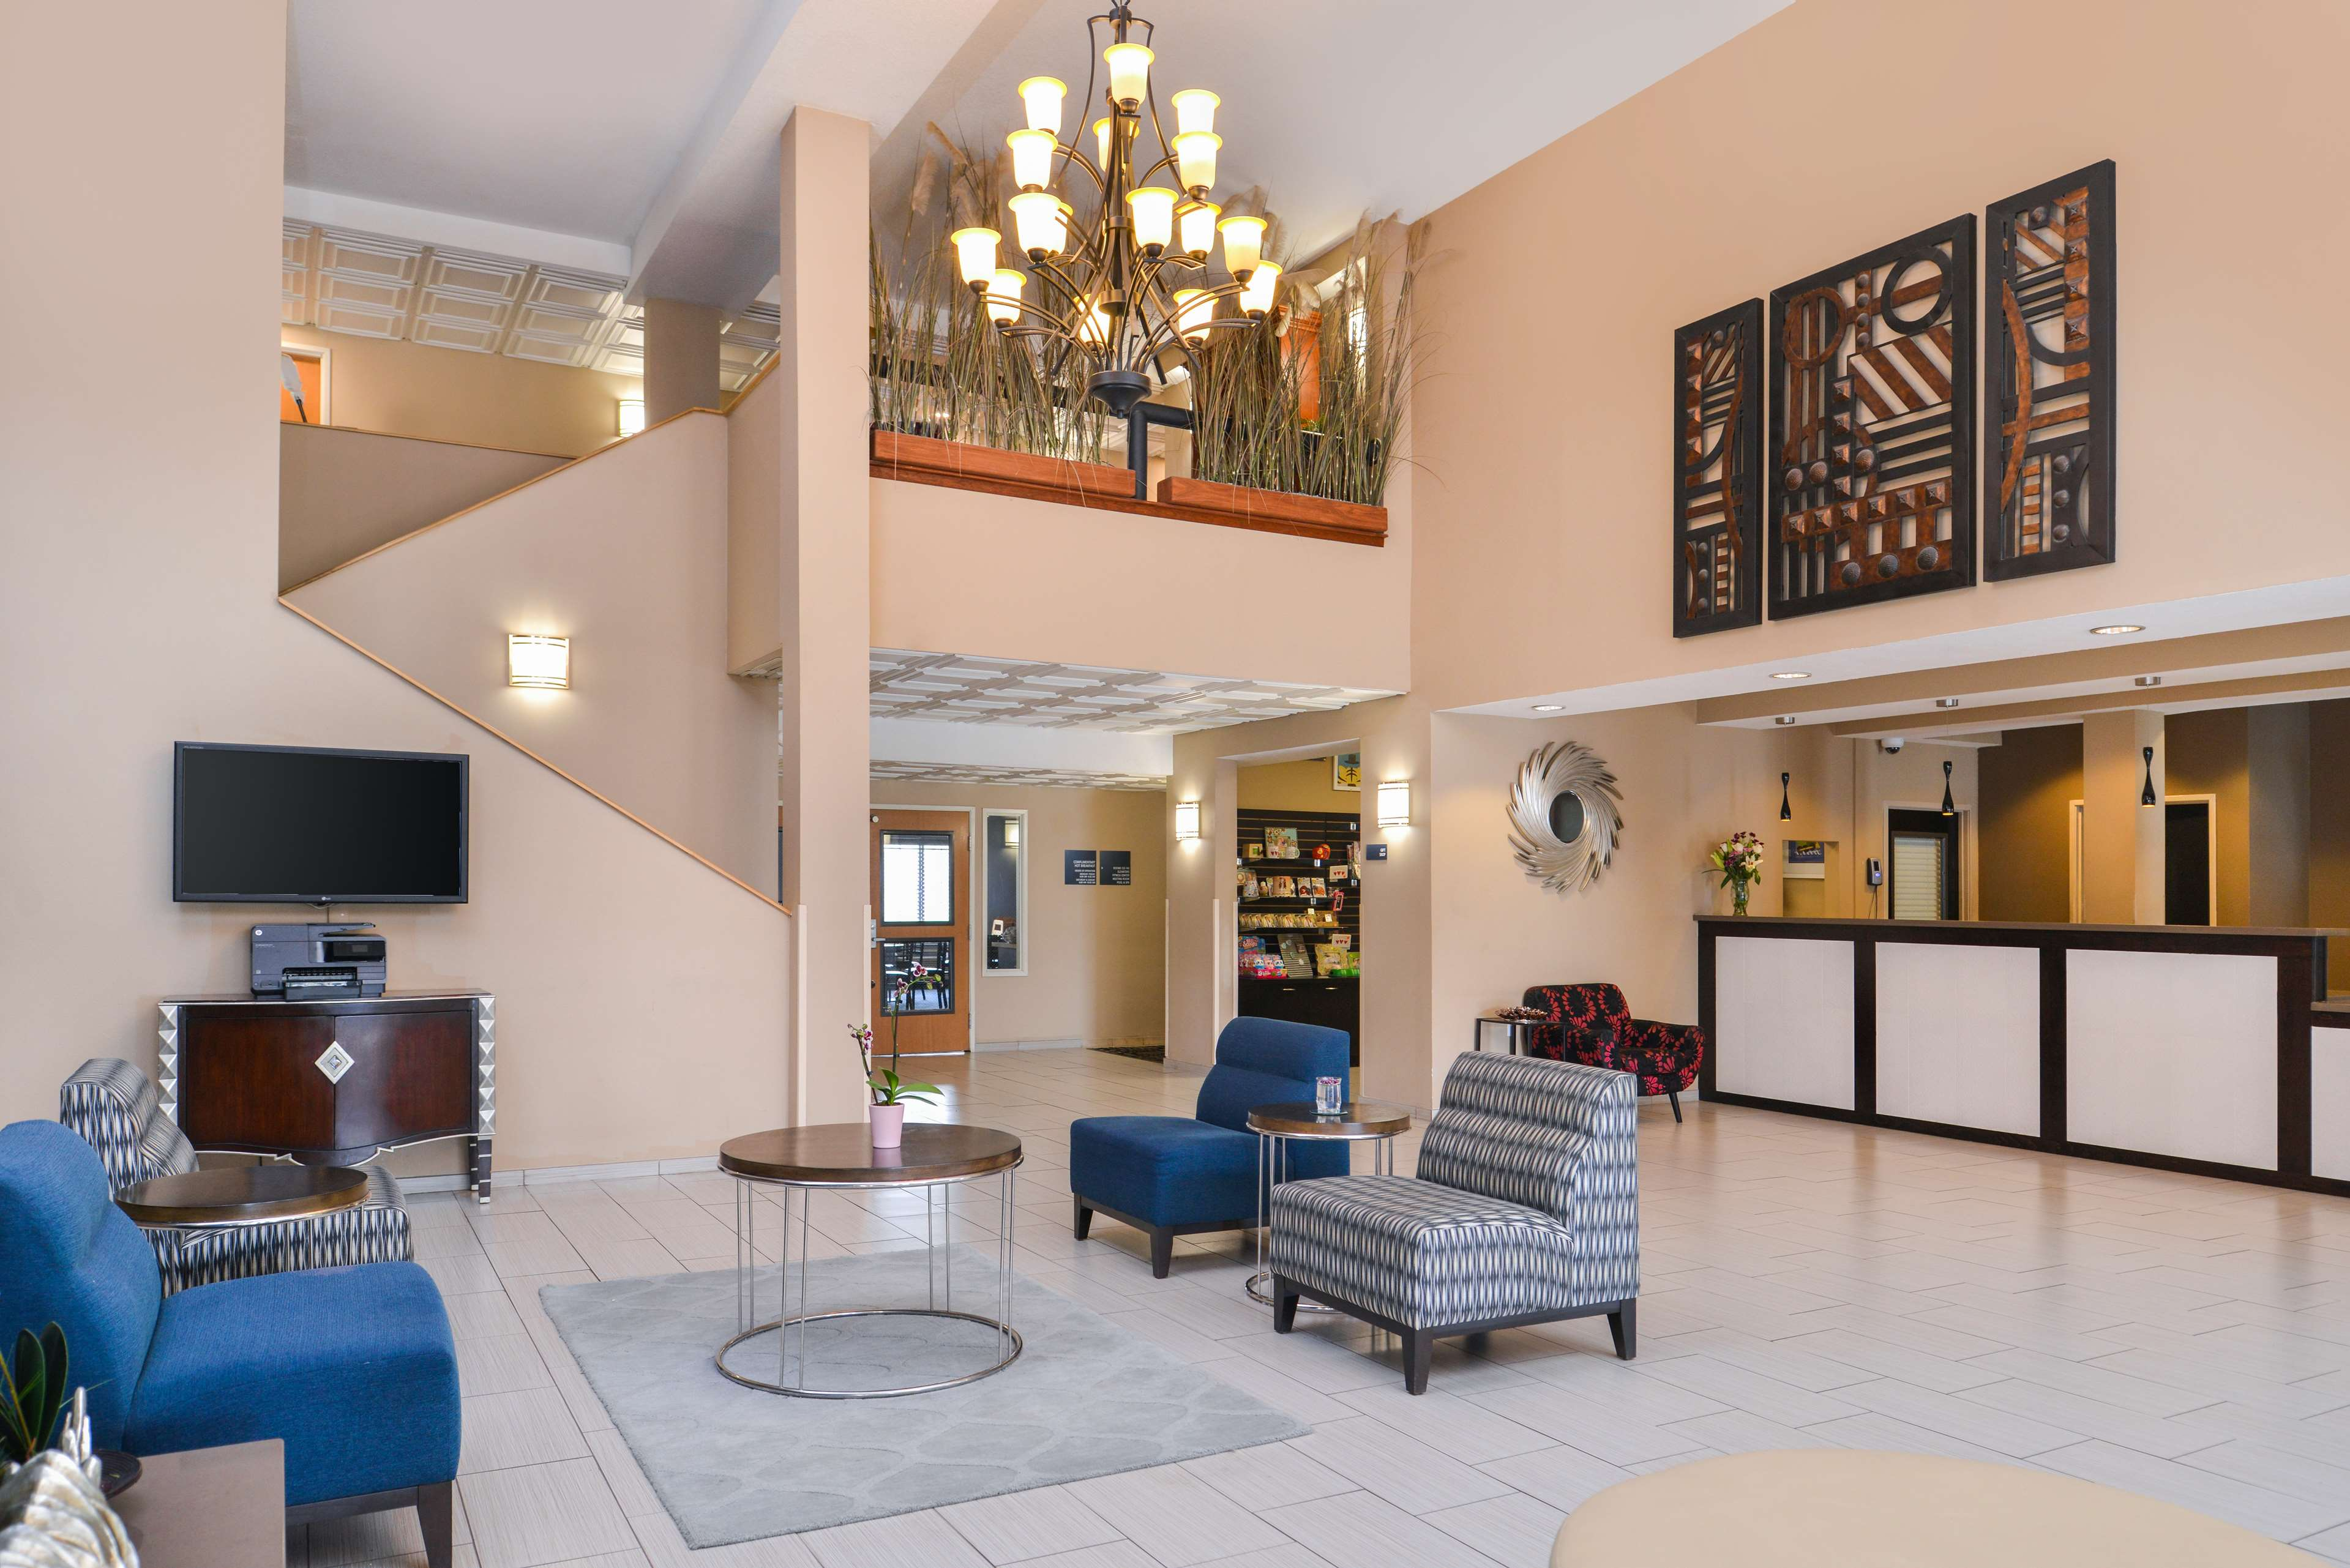 Best Western Plus Mountain View Auburn Inn image 7